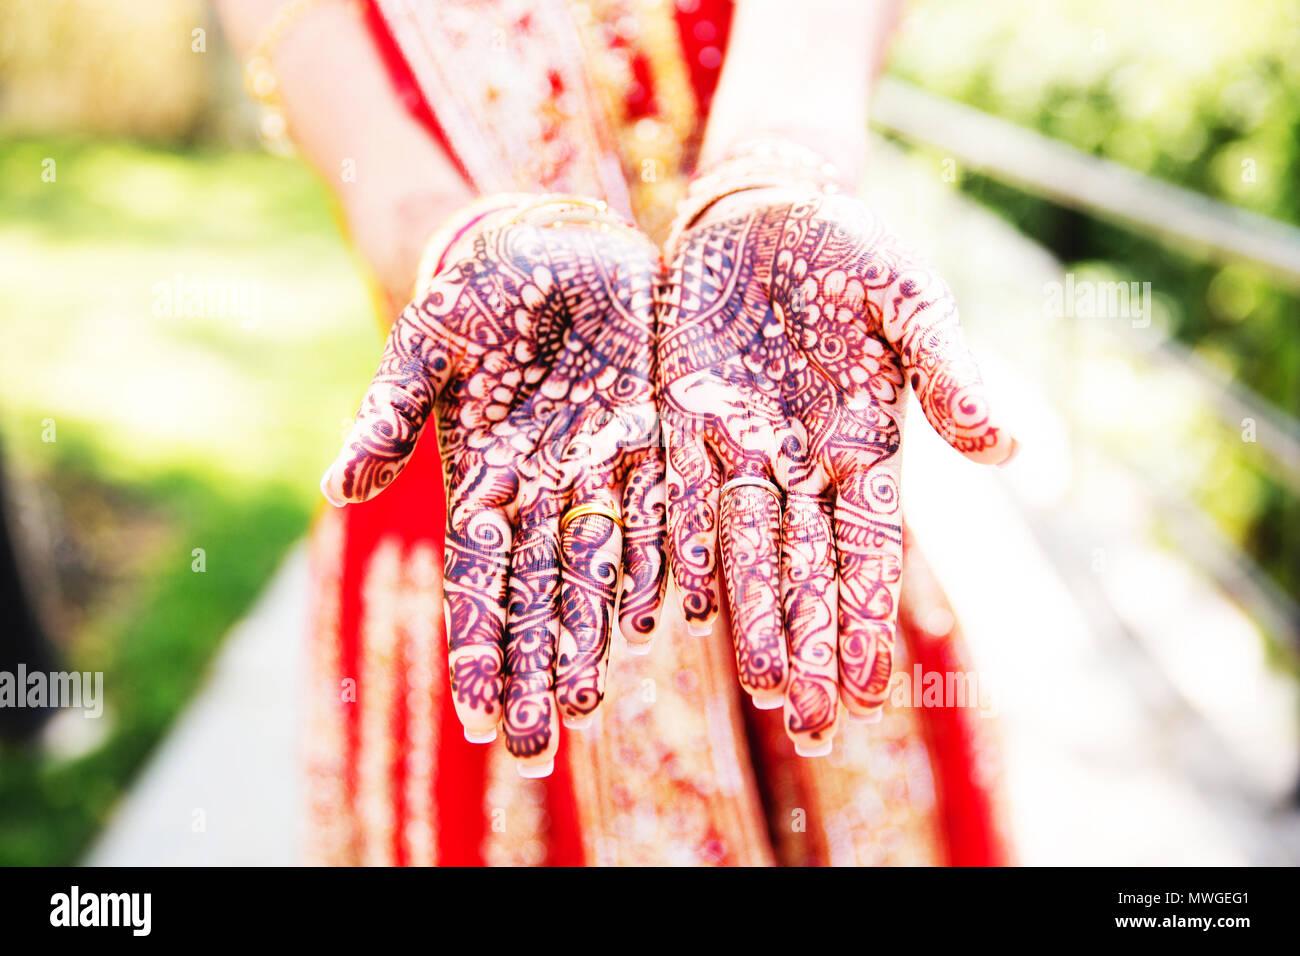 Pakistani bride Show hand mehndi design - Stock Image